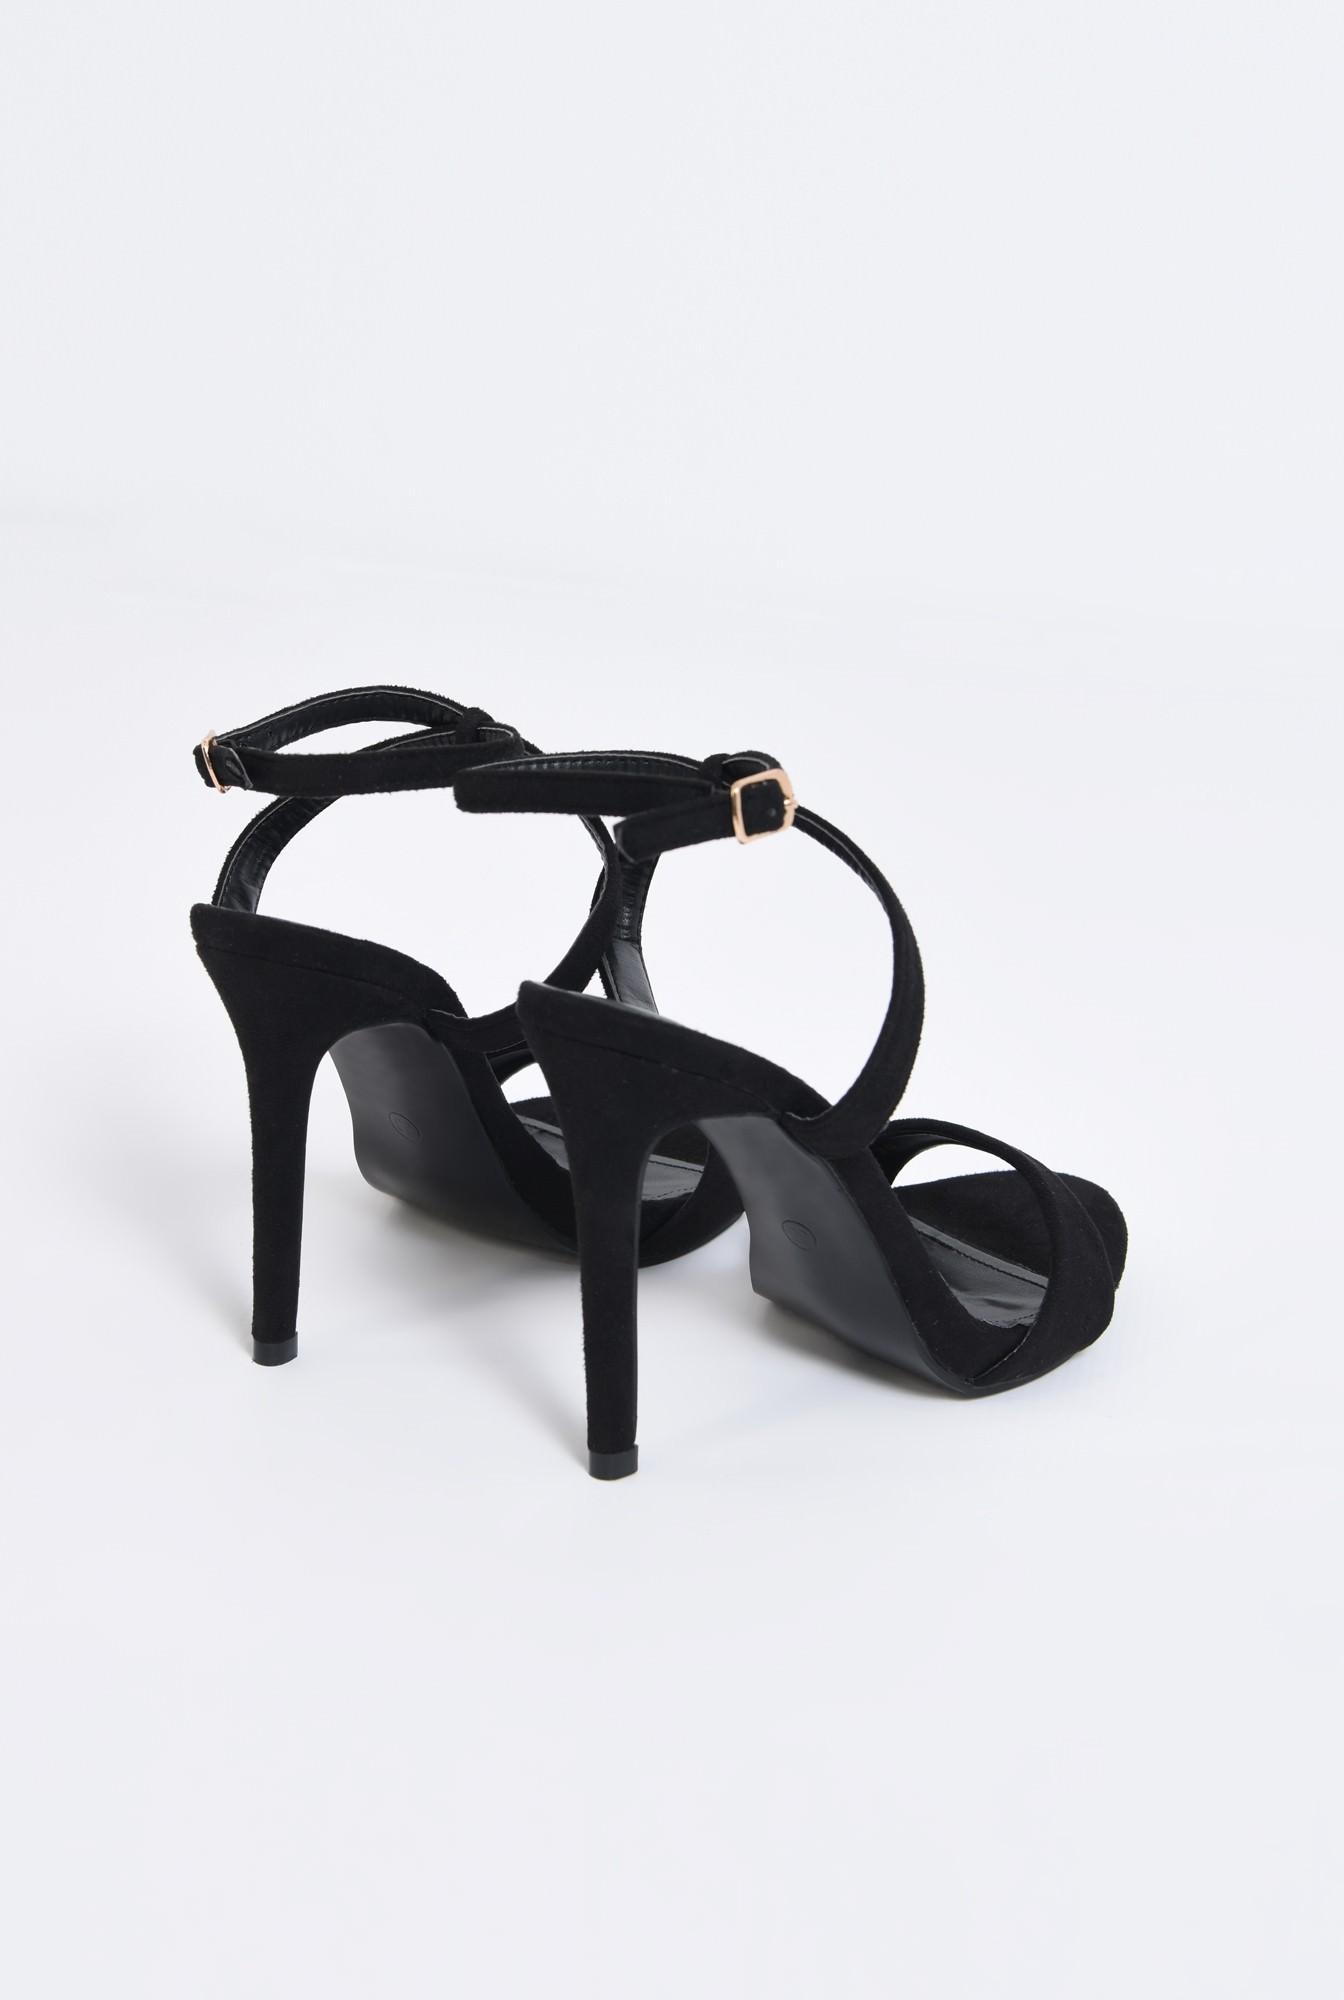 2 - sandale elegante, velur, negru, toc cui